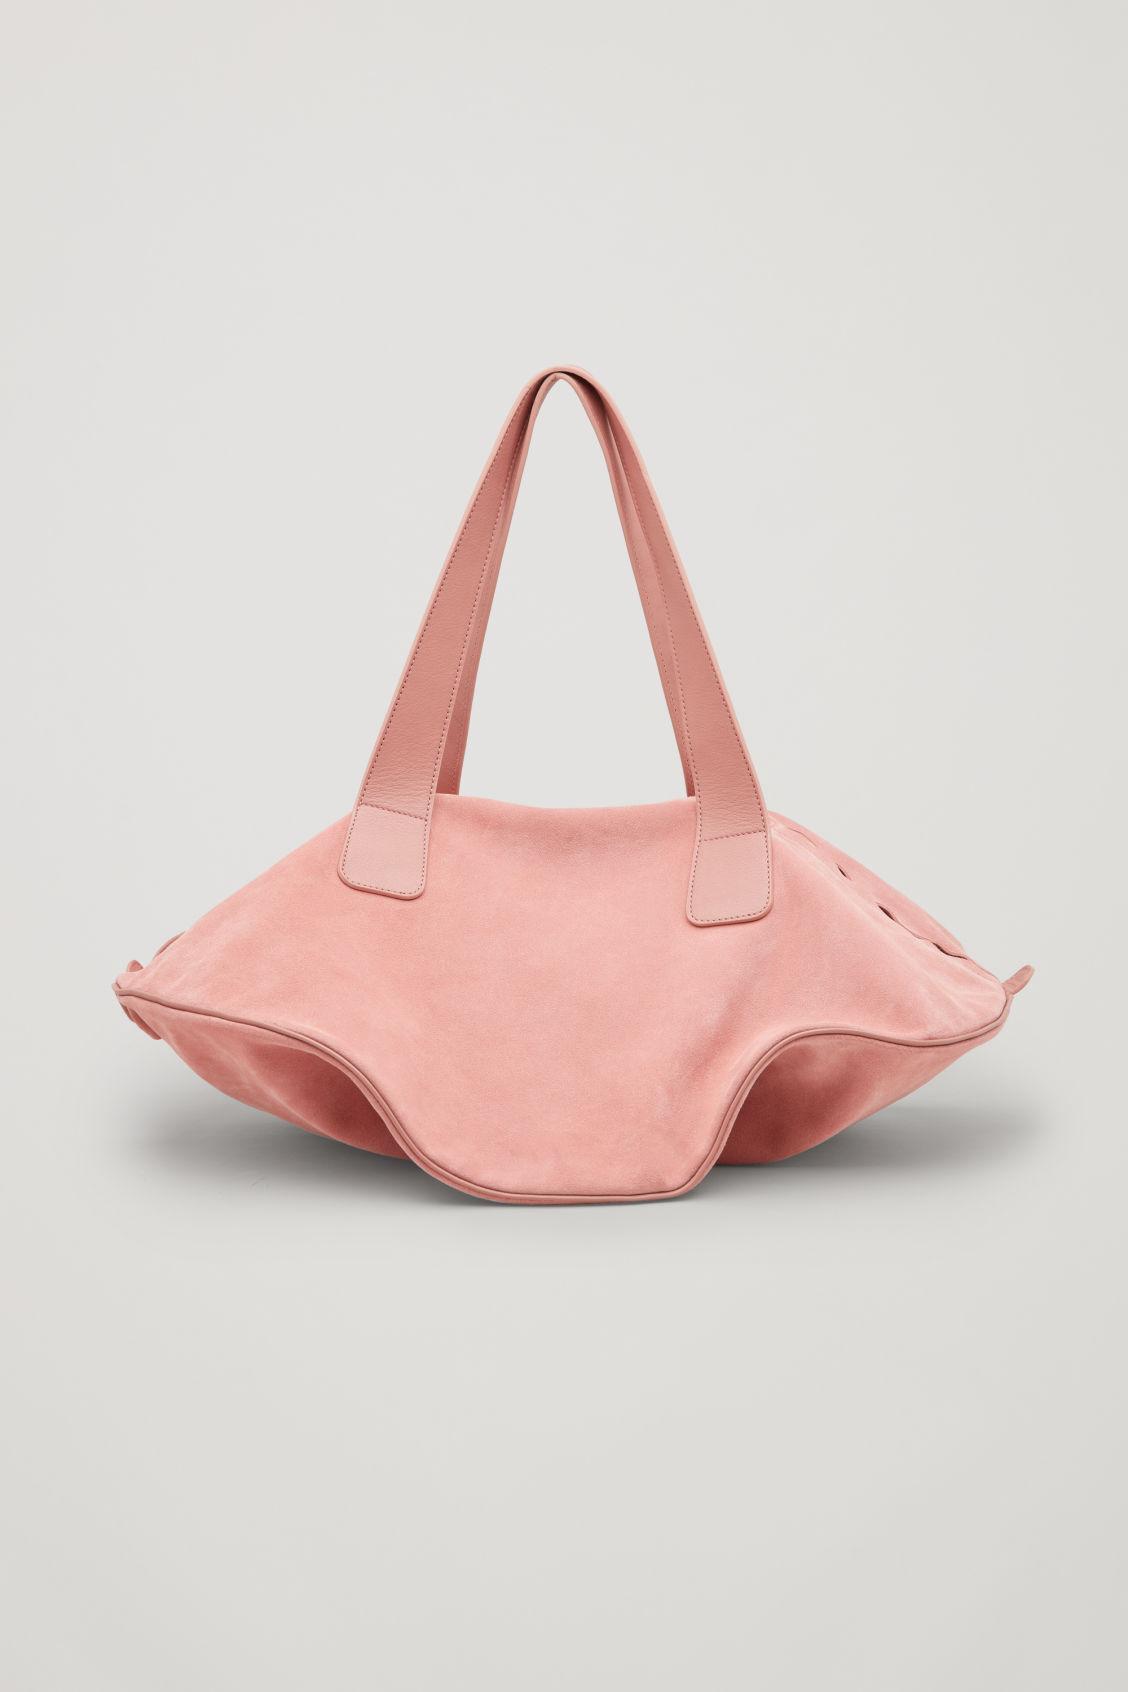 CIRCULAR SUEDE BAG